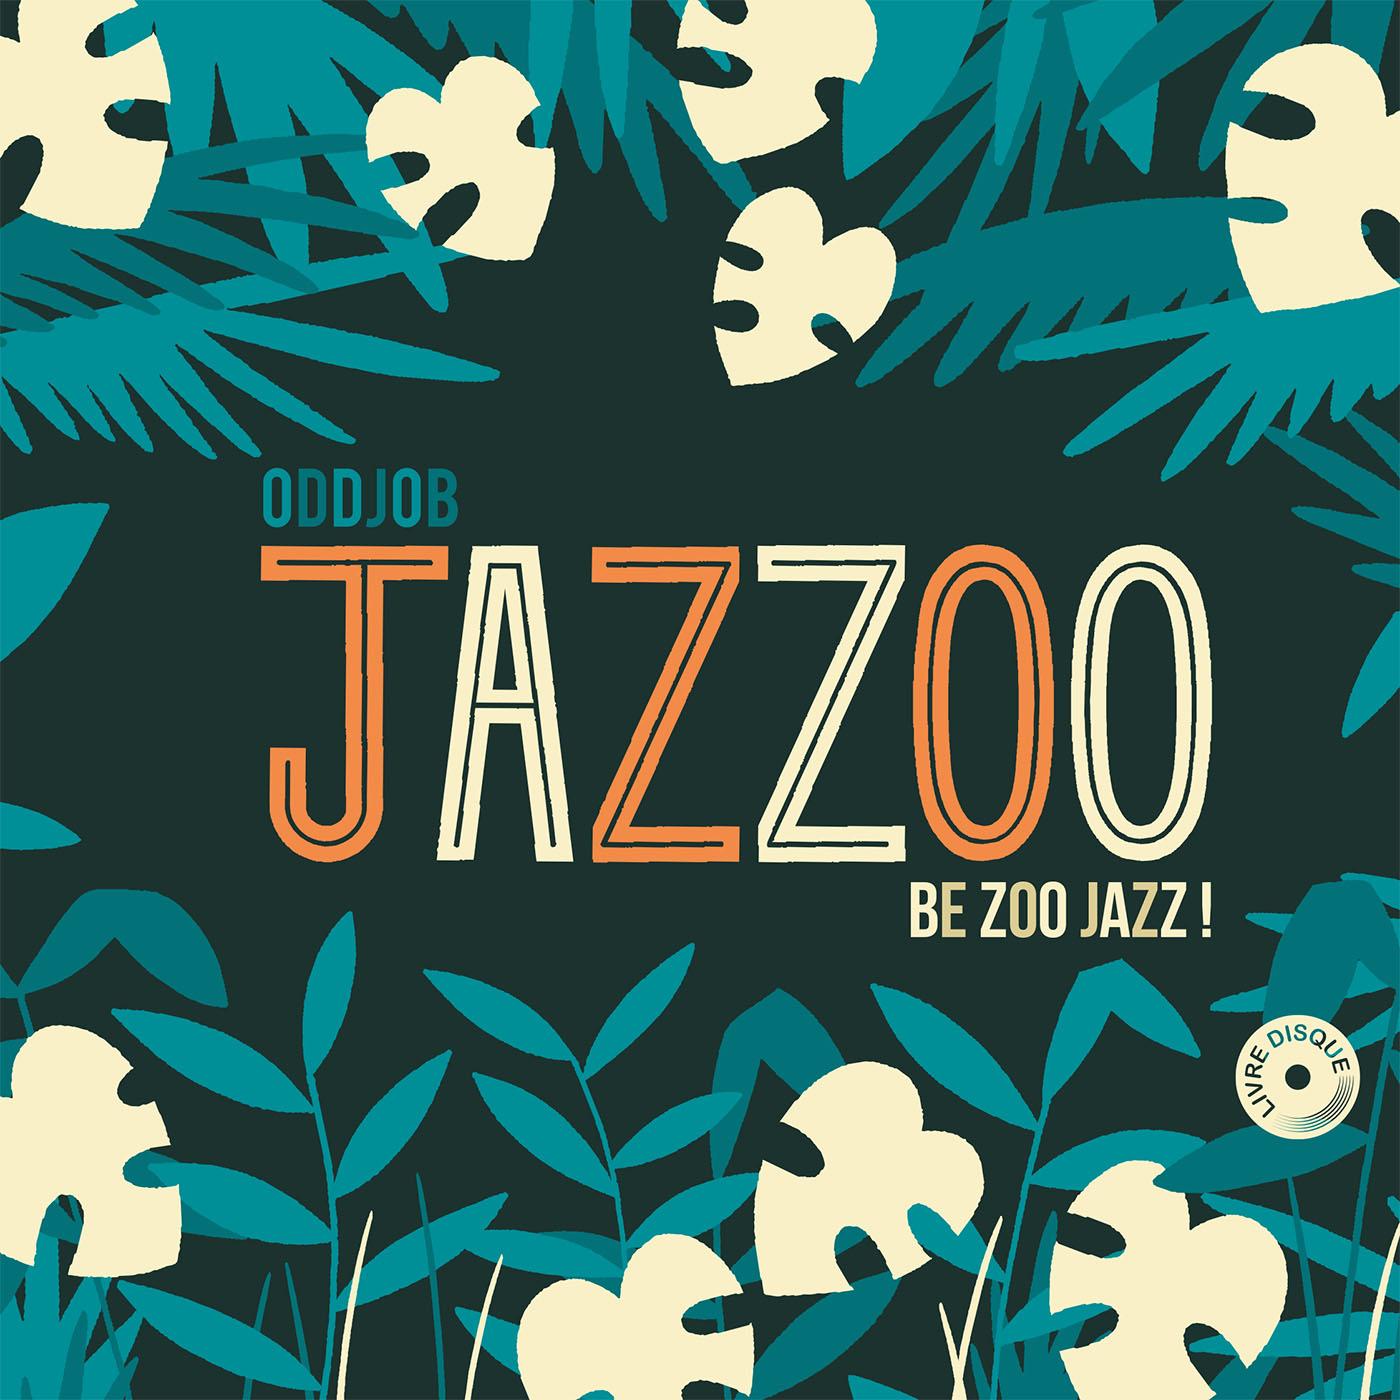 Livre disque Jazzoo Be Zoo Jazz - Oddjob